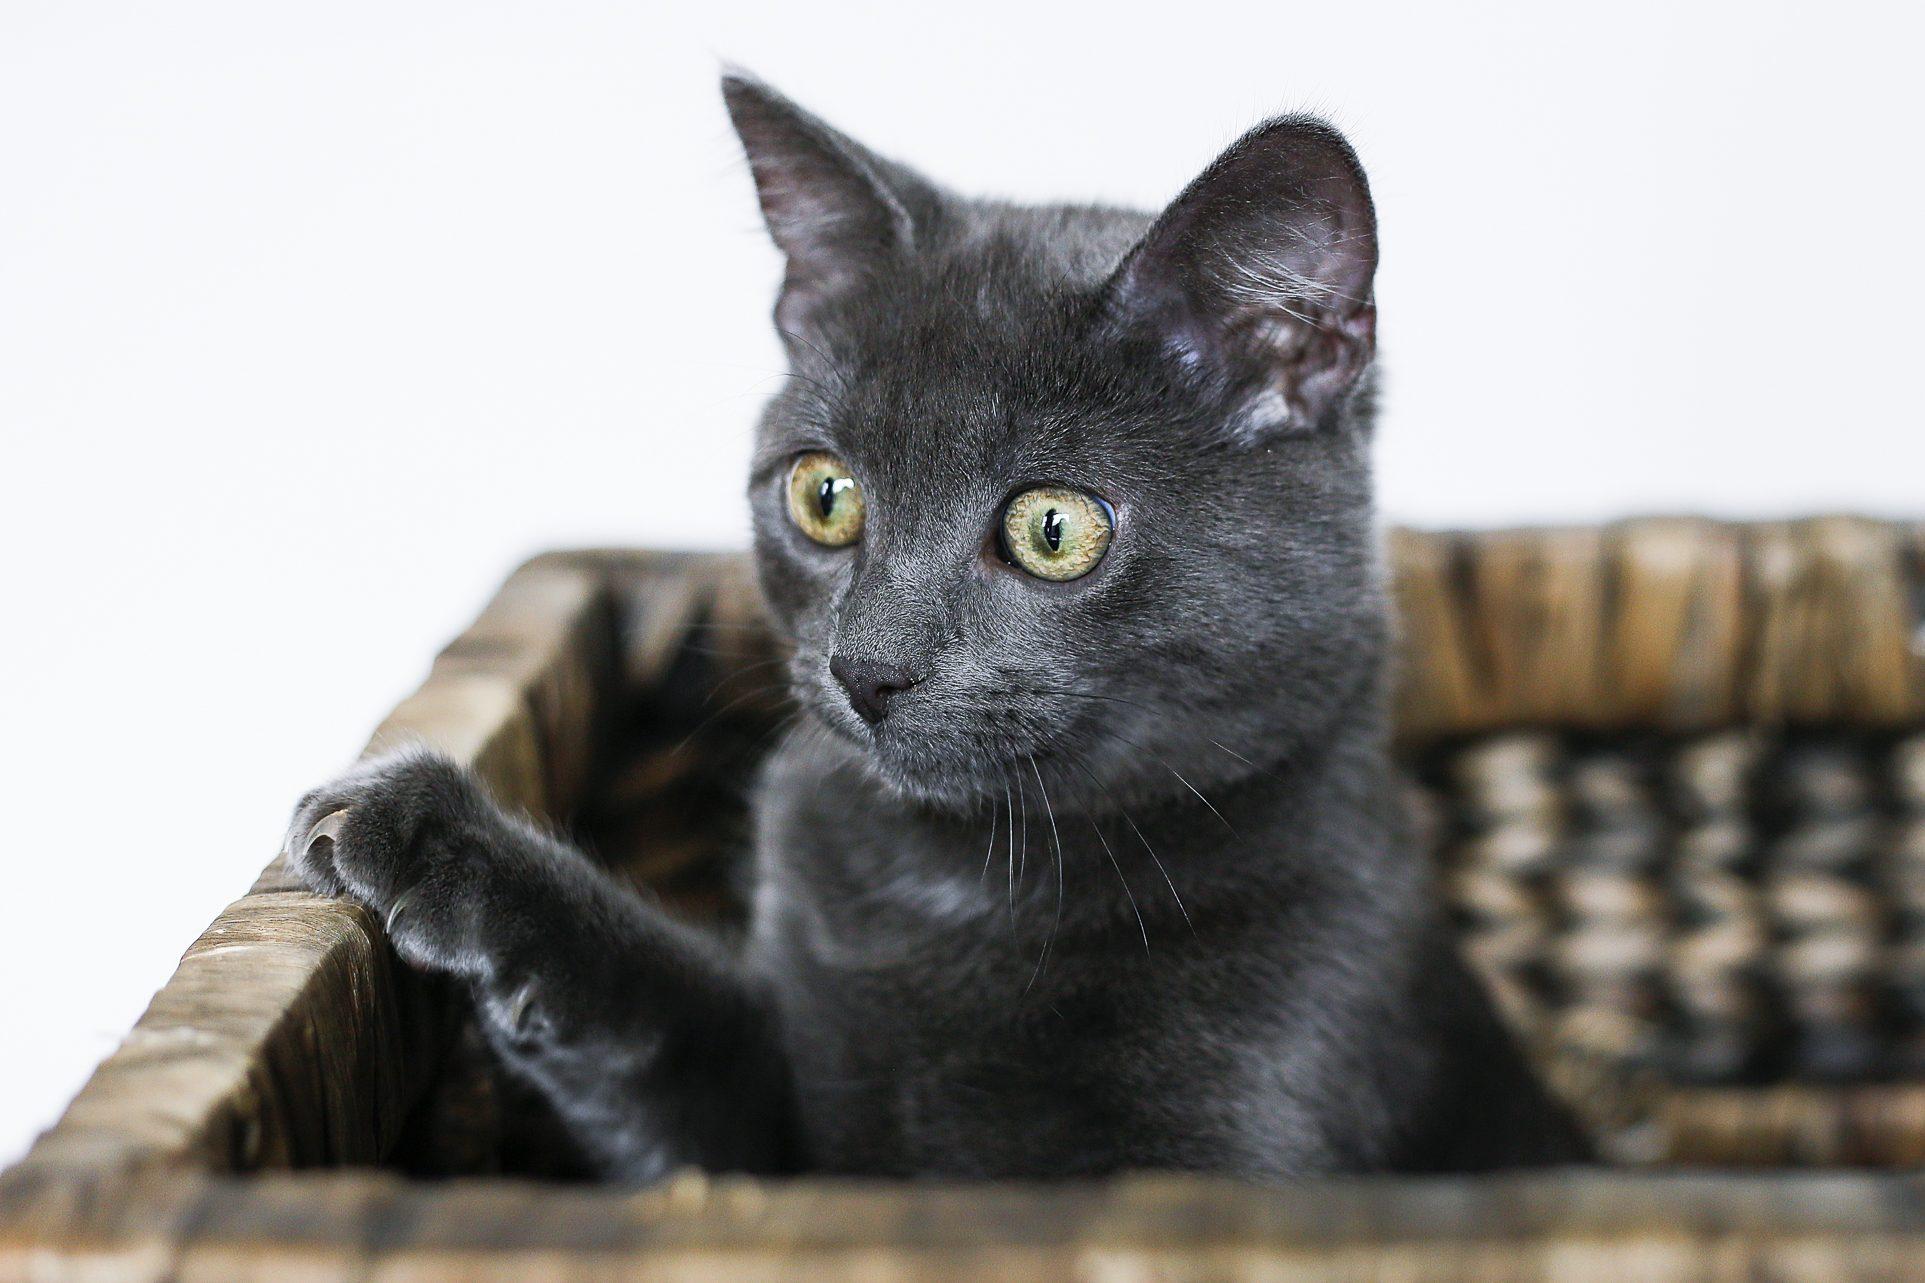 Neelix the Kitty enjoying the box